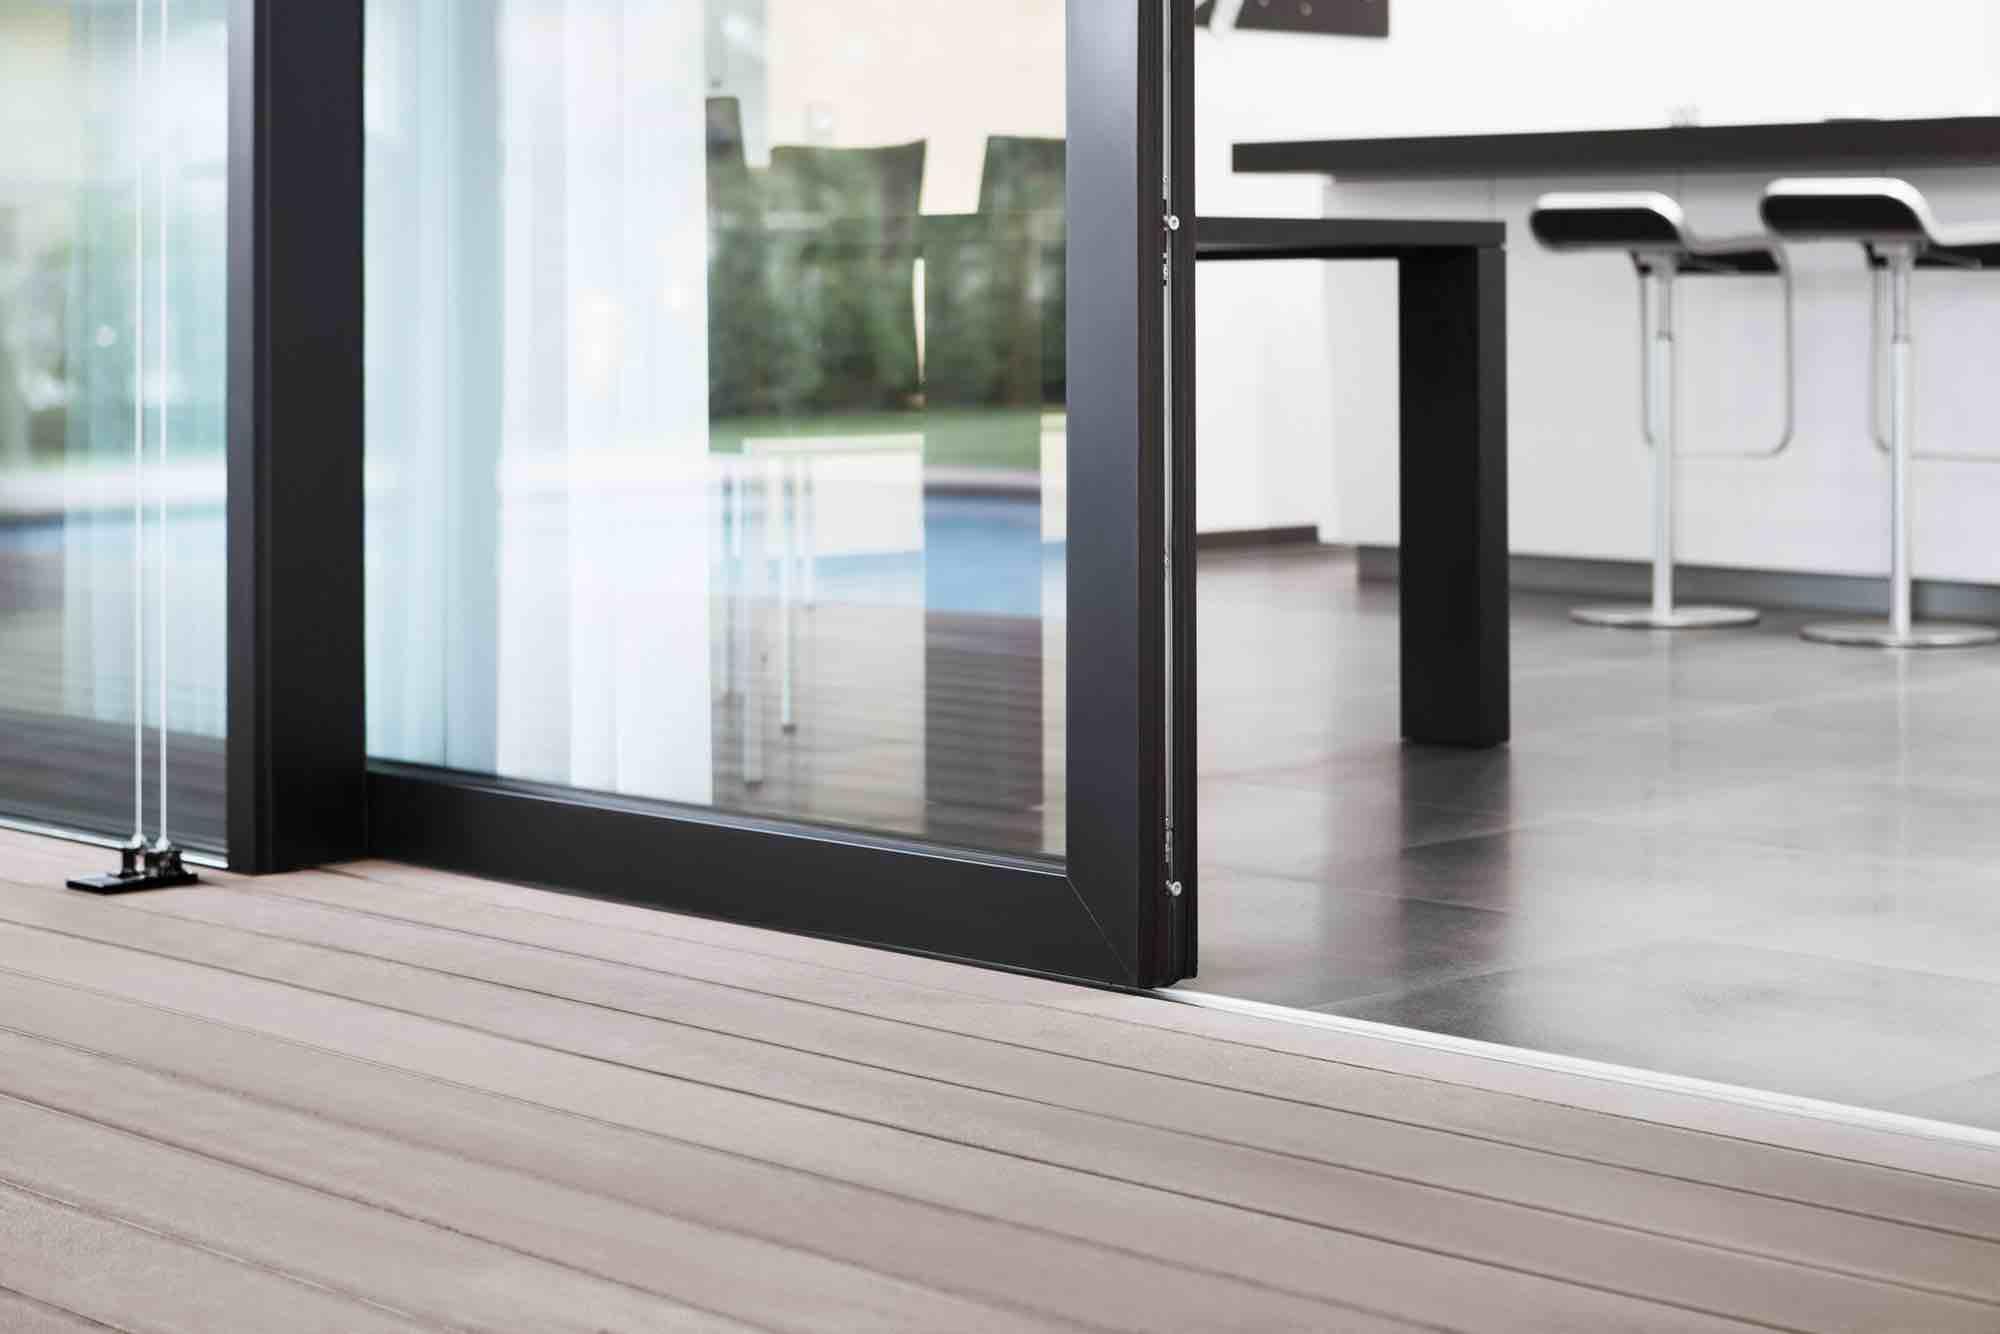 m2-house-monovolume-architecture-design_villa_moritzing_19